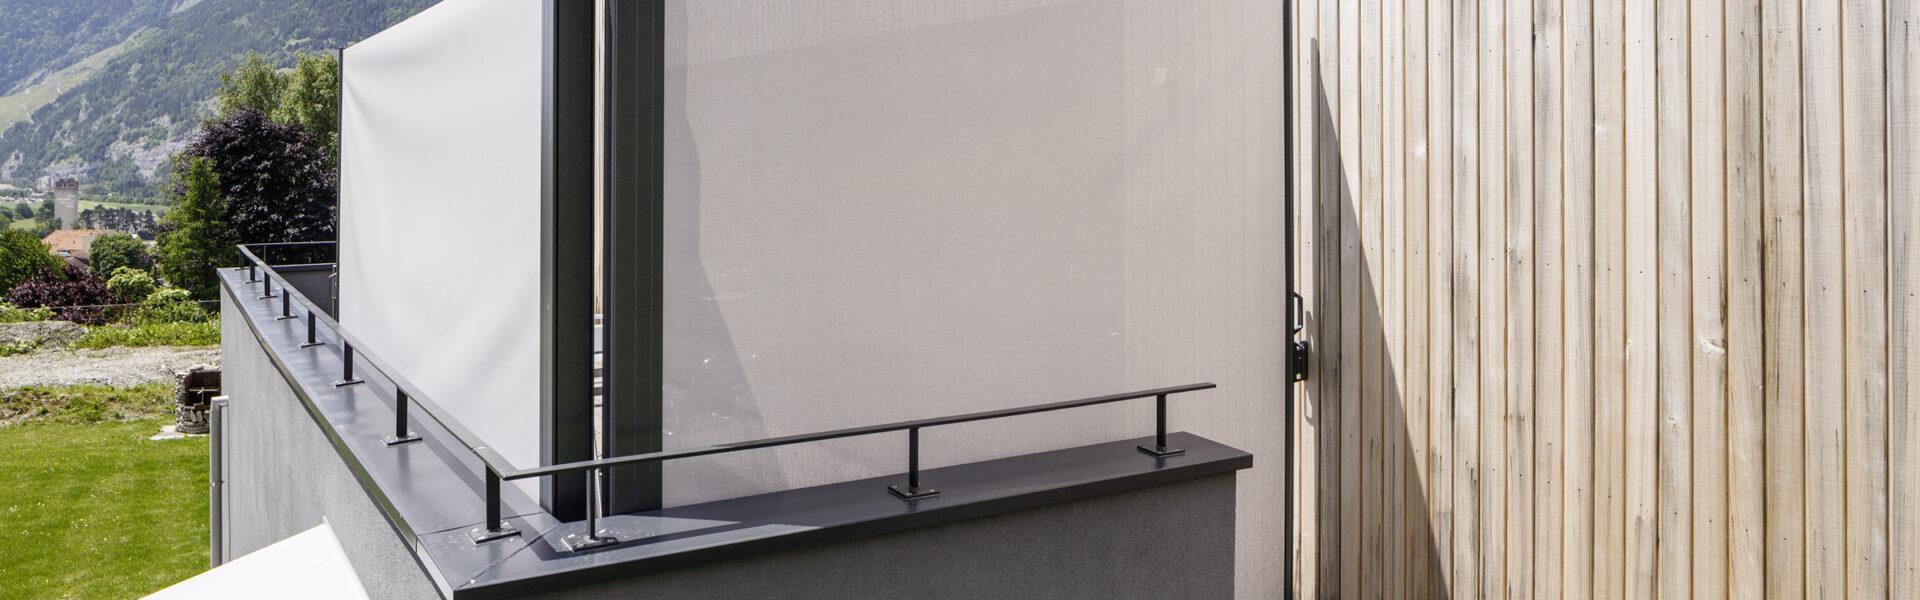 ombra Windschutz & Sichtschutz & Balkonschutz